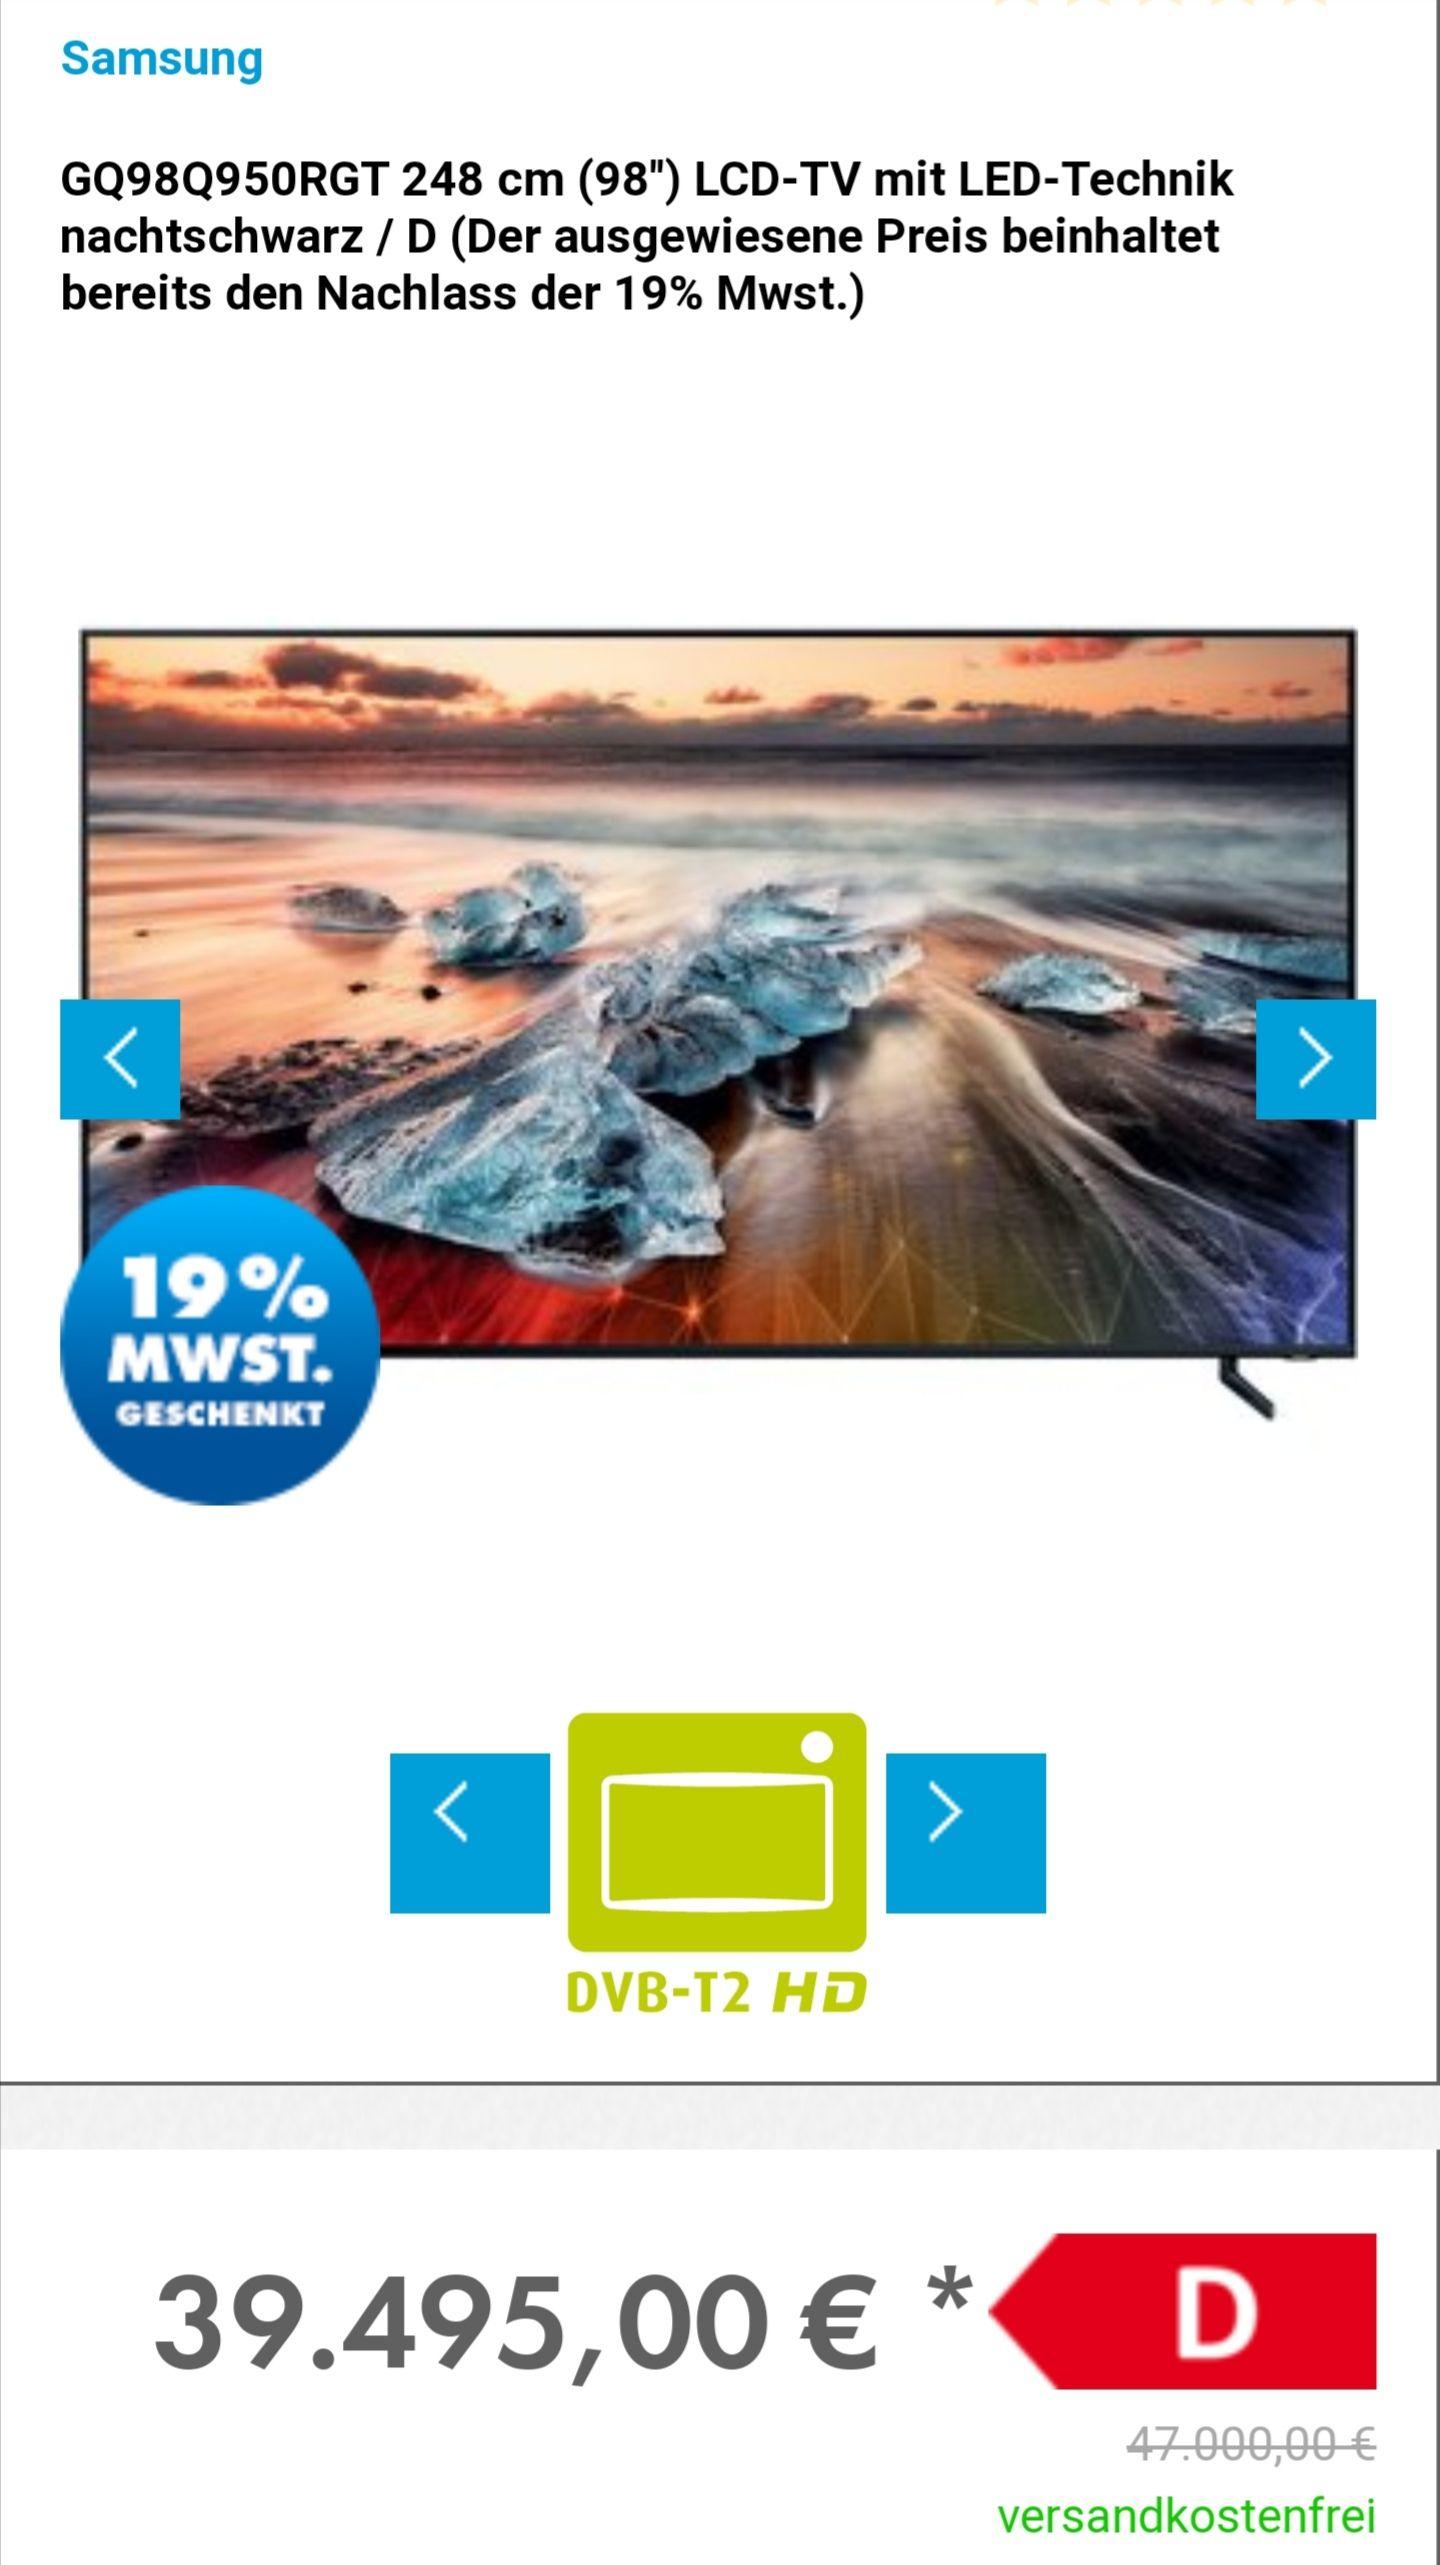 SAMSUNG GQ98Q950RGTXZG, 248 CM (98 ZOLL), UHD 8K, SMART TV, QLED TV, 4300 PQI, DVB-T2 HD, DVB-C, DVB-S, DVB-S2